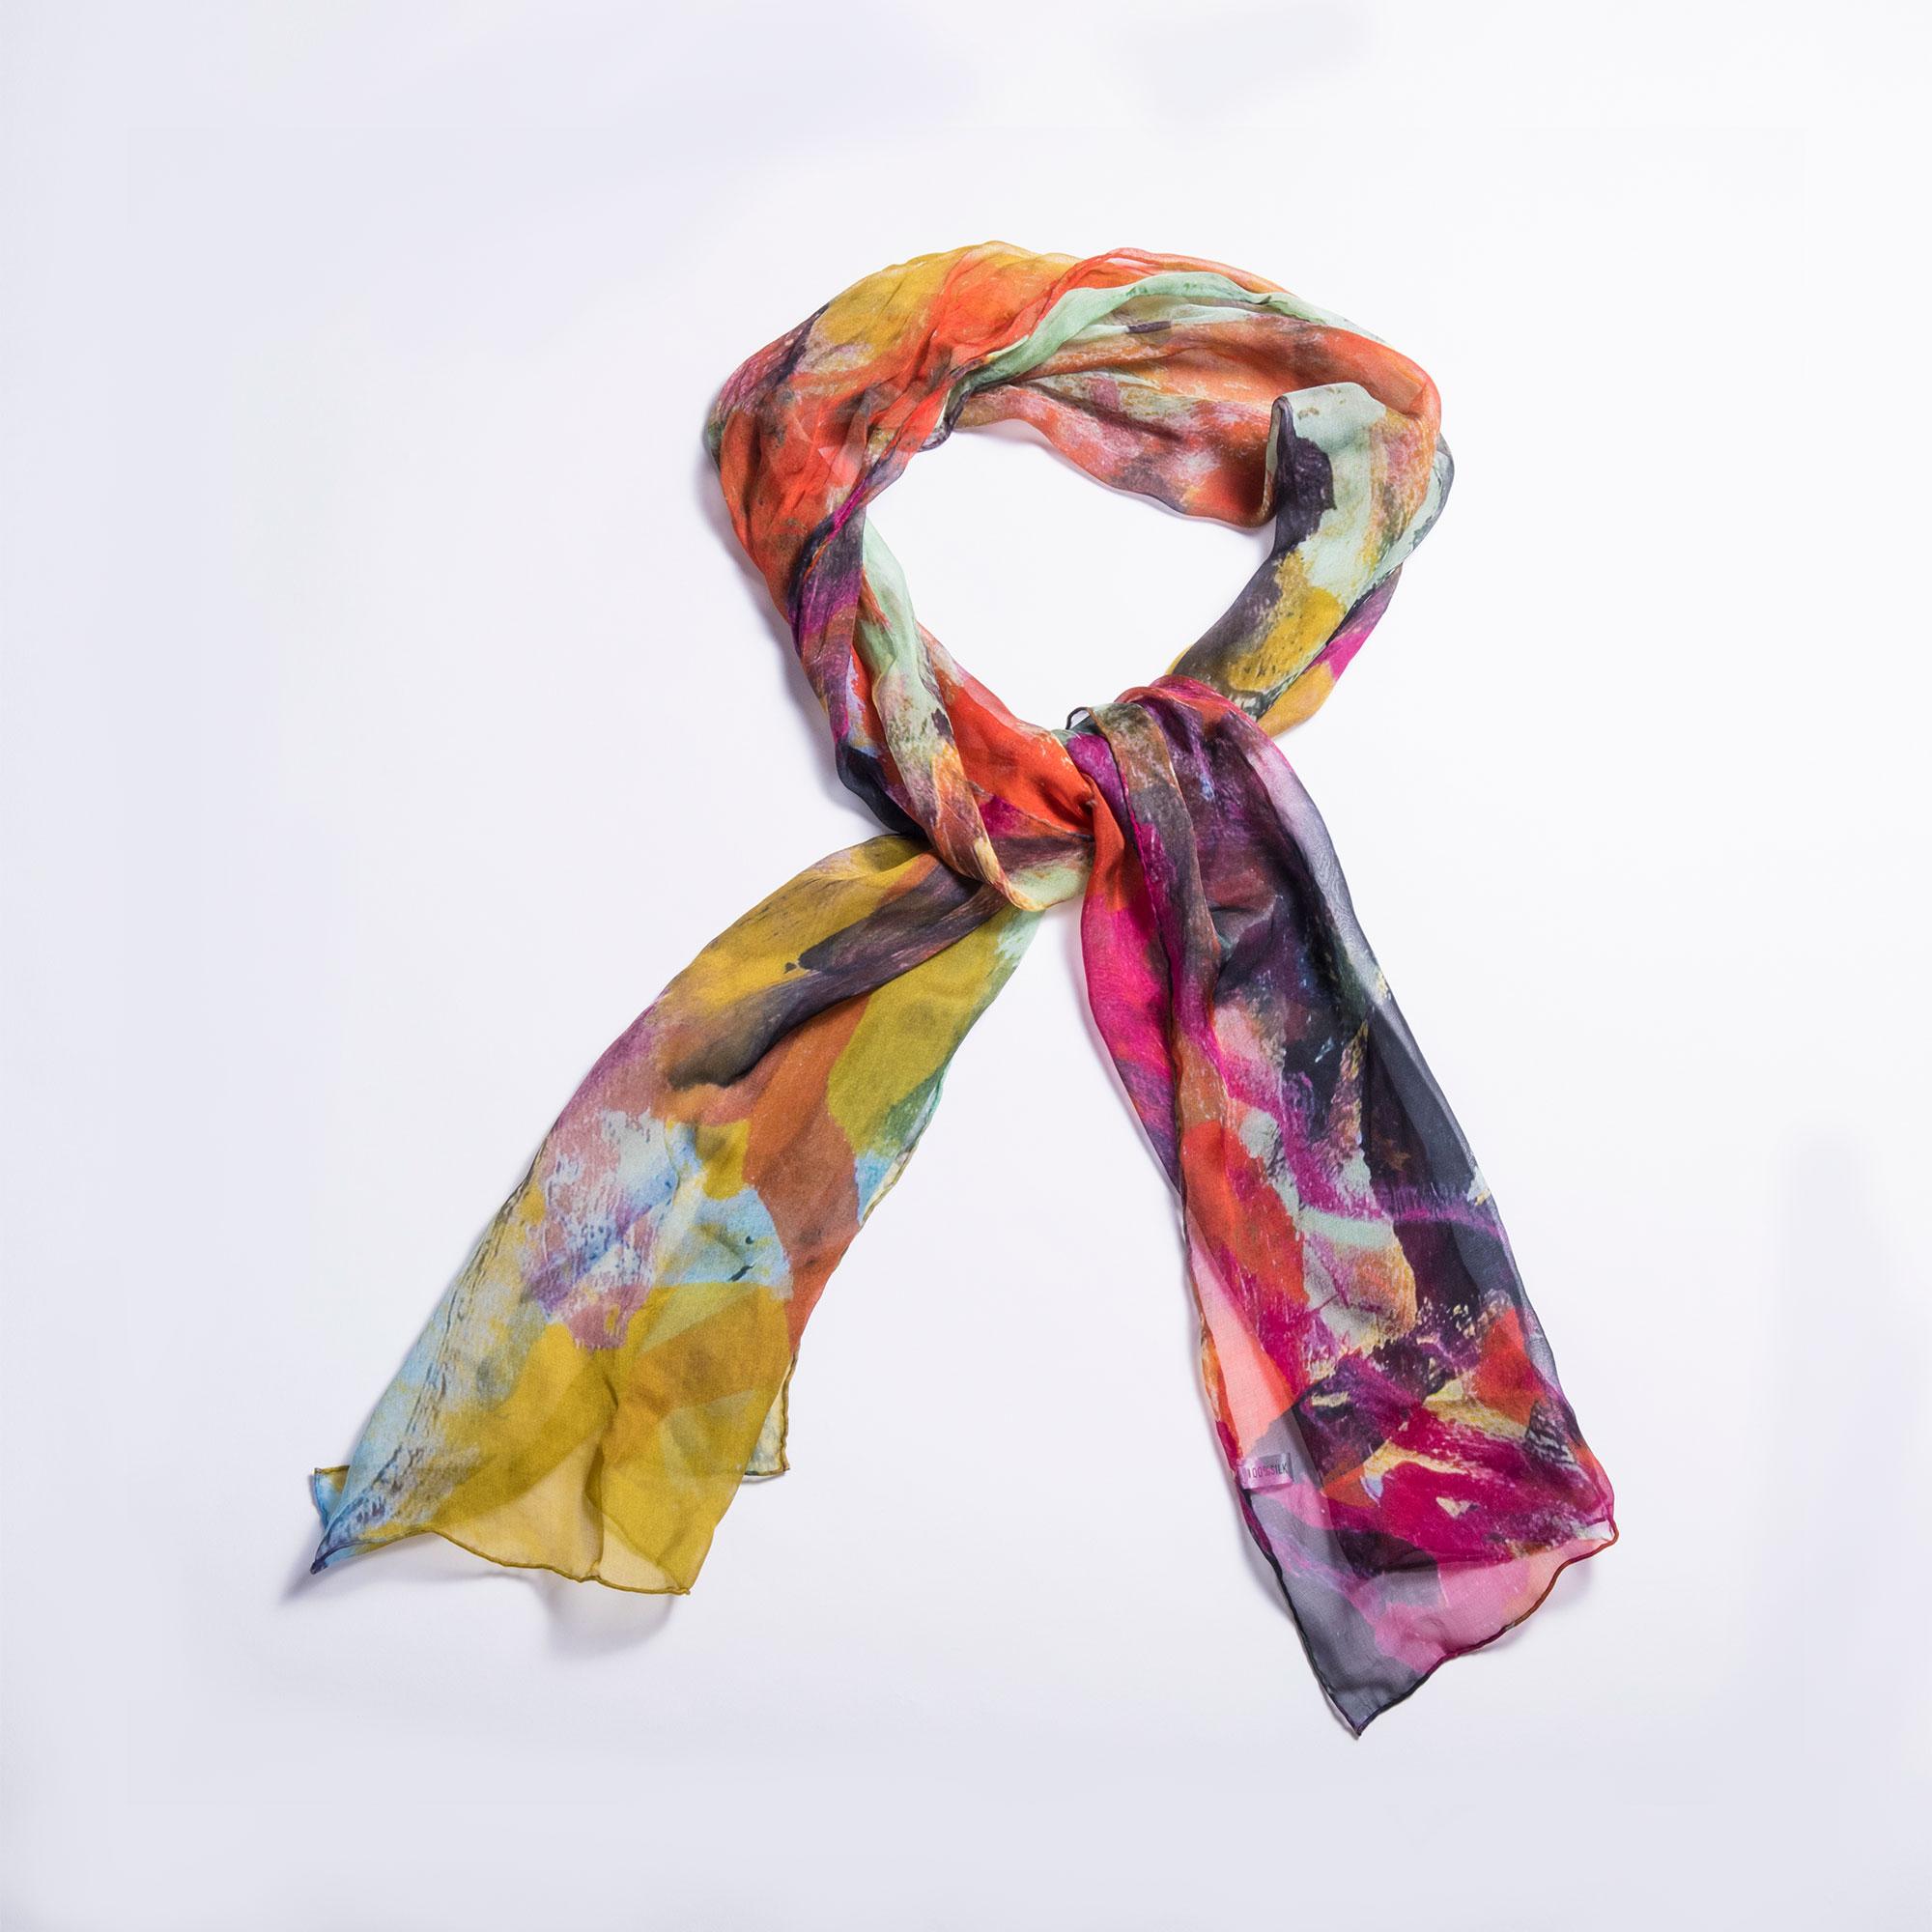 Silk Scarf based on Untitled